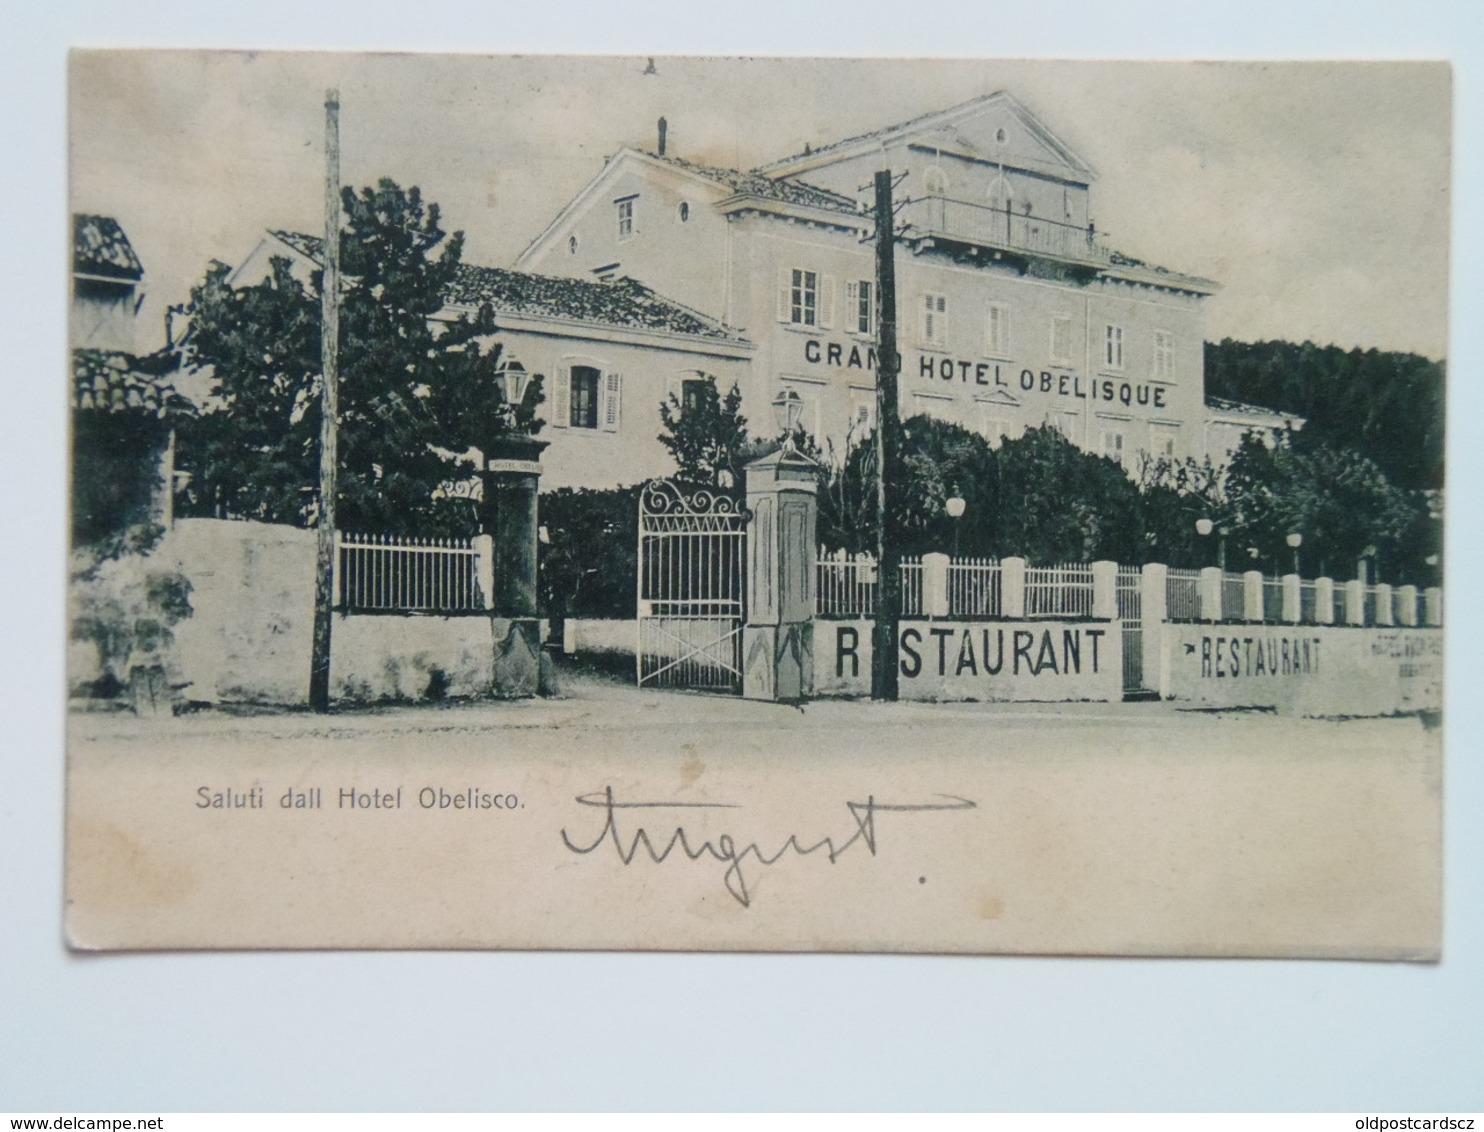 Trieste 343 Opcina Opicina Auto 1900 Albergo Hotel Grand Obeliscque Obelisco Restauranr - Otras Ciudades